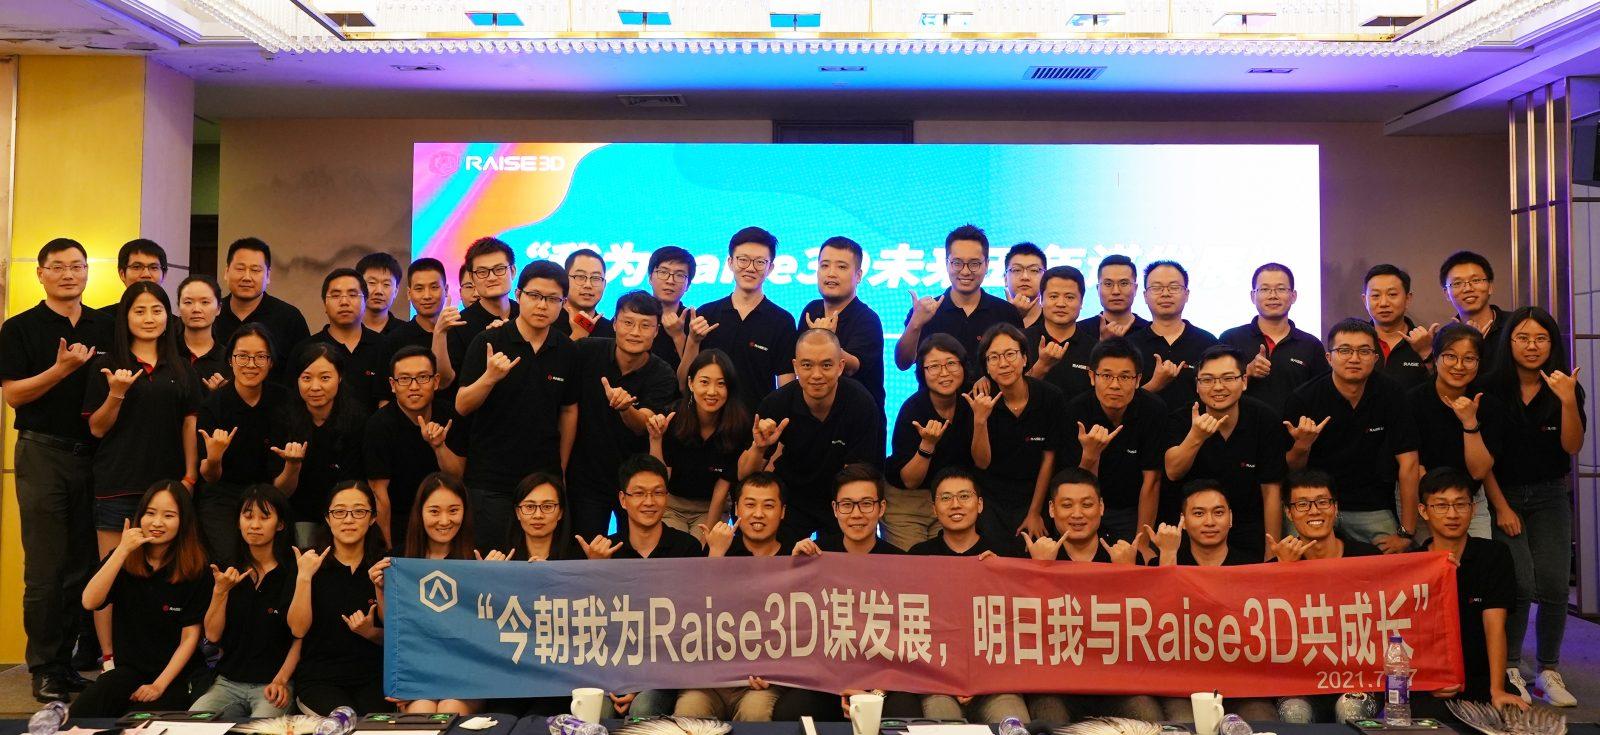 Raise3D 2021年上半年度经营工作会议在上海佘山顺利举行